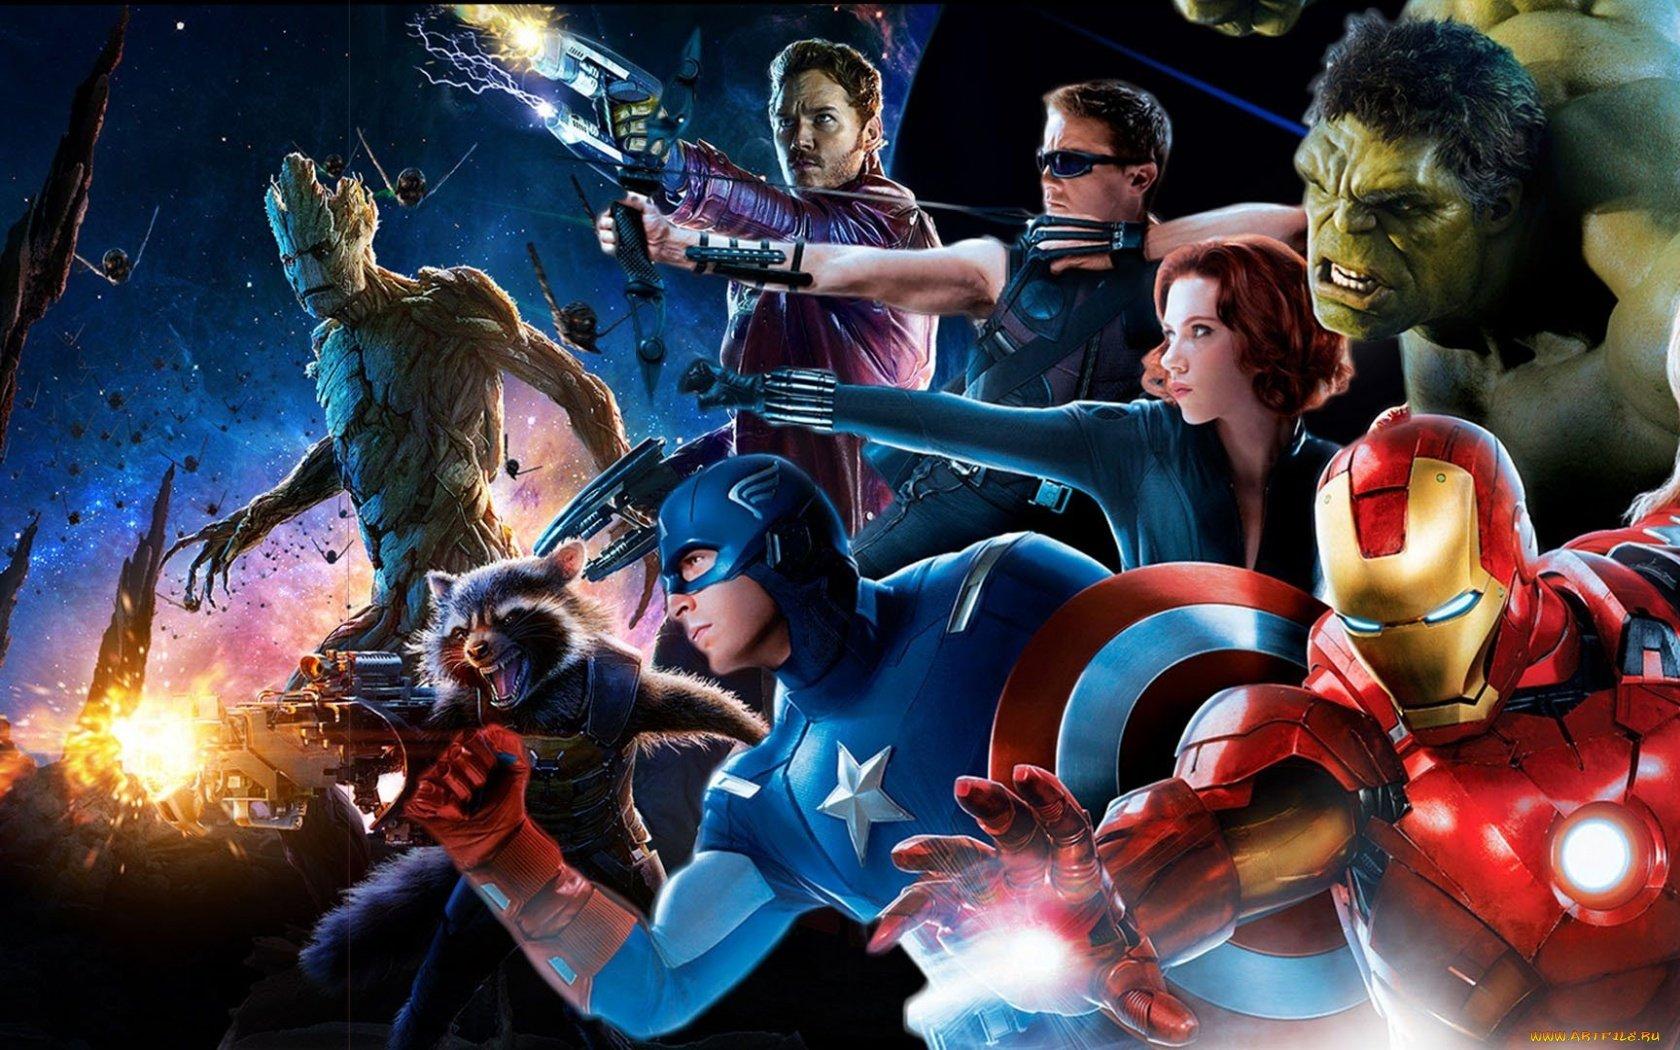 Мстители 4 Picture: «Мстители: Война бесконечности» стал рекордсменом по